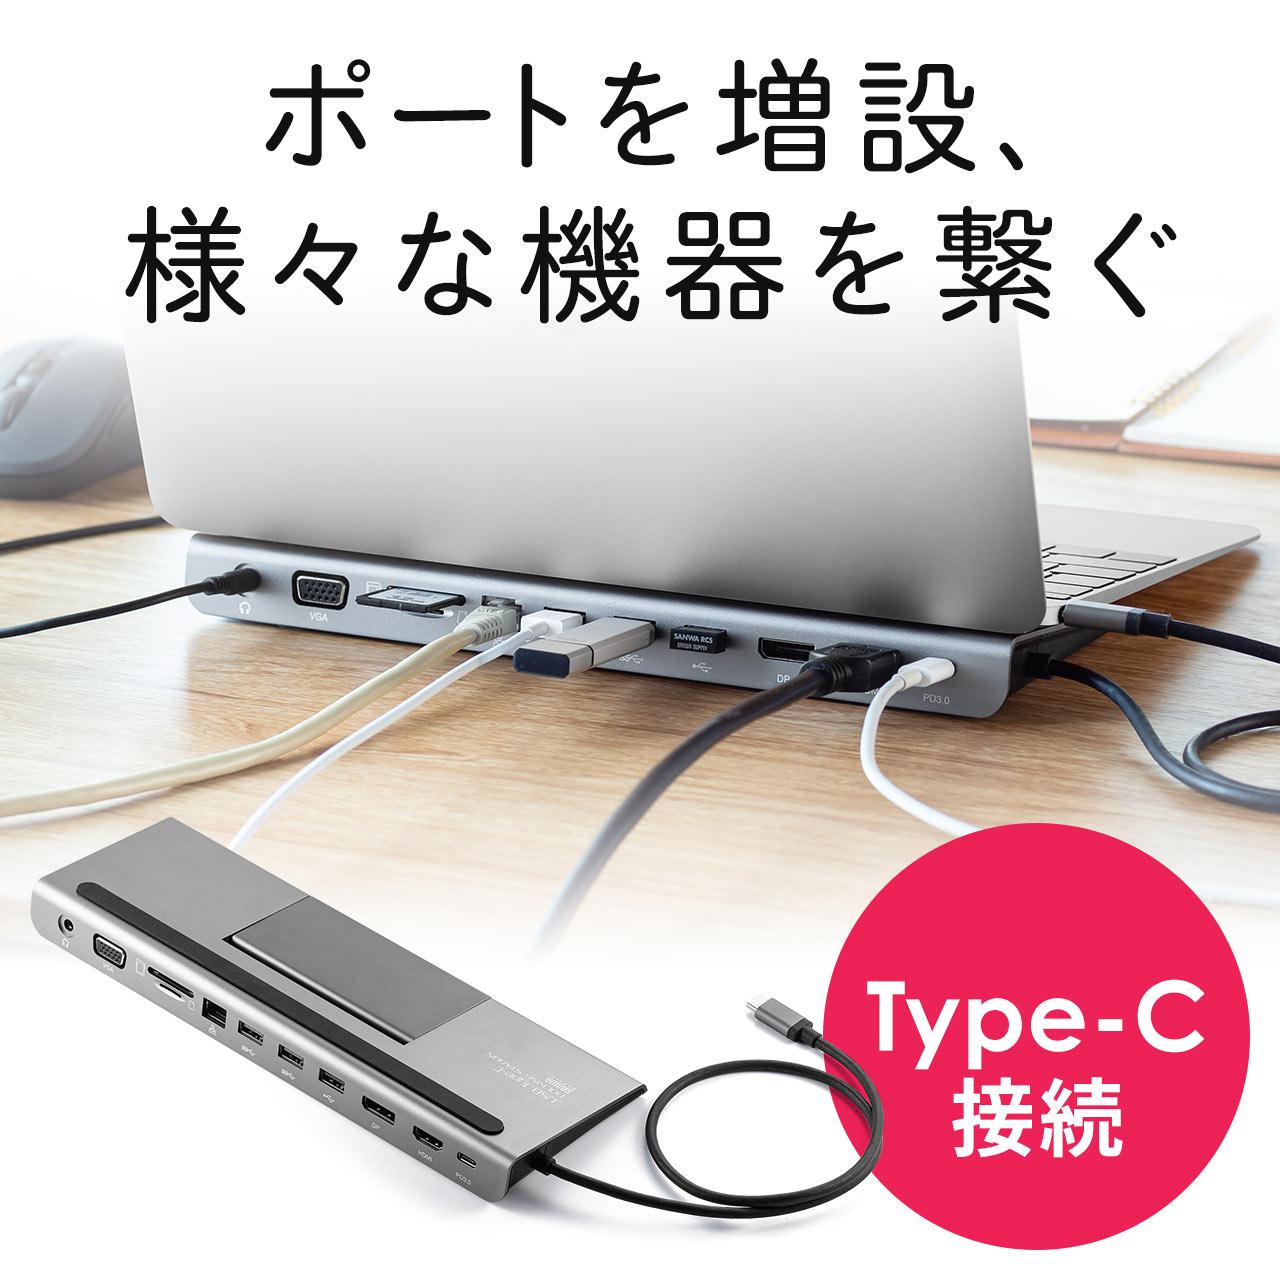 400-VGA017 サンワダイレクト限定品 送料無料 掘り出しモノ USB3.2 ドッキングステーション Type-C ハブ USB PD100W対応 USB3.1 Gen1 物品 お見舞い 有線LAN HDMI DisplayPort VGA 2画面同時出力 SDカード microSD カードリーダー おしゃれ